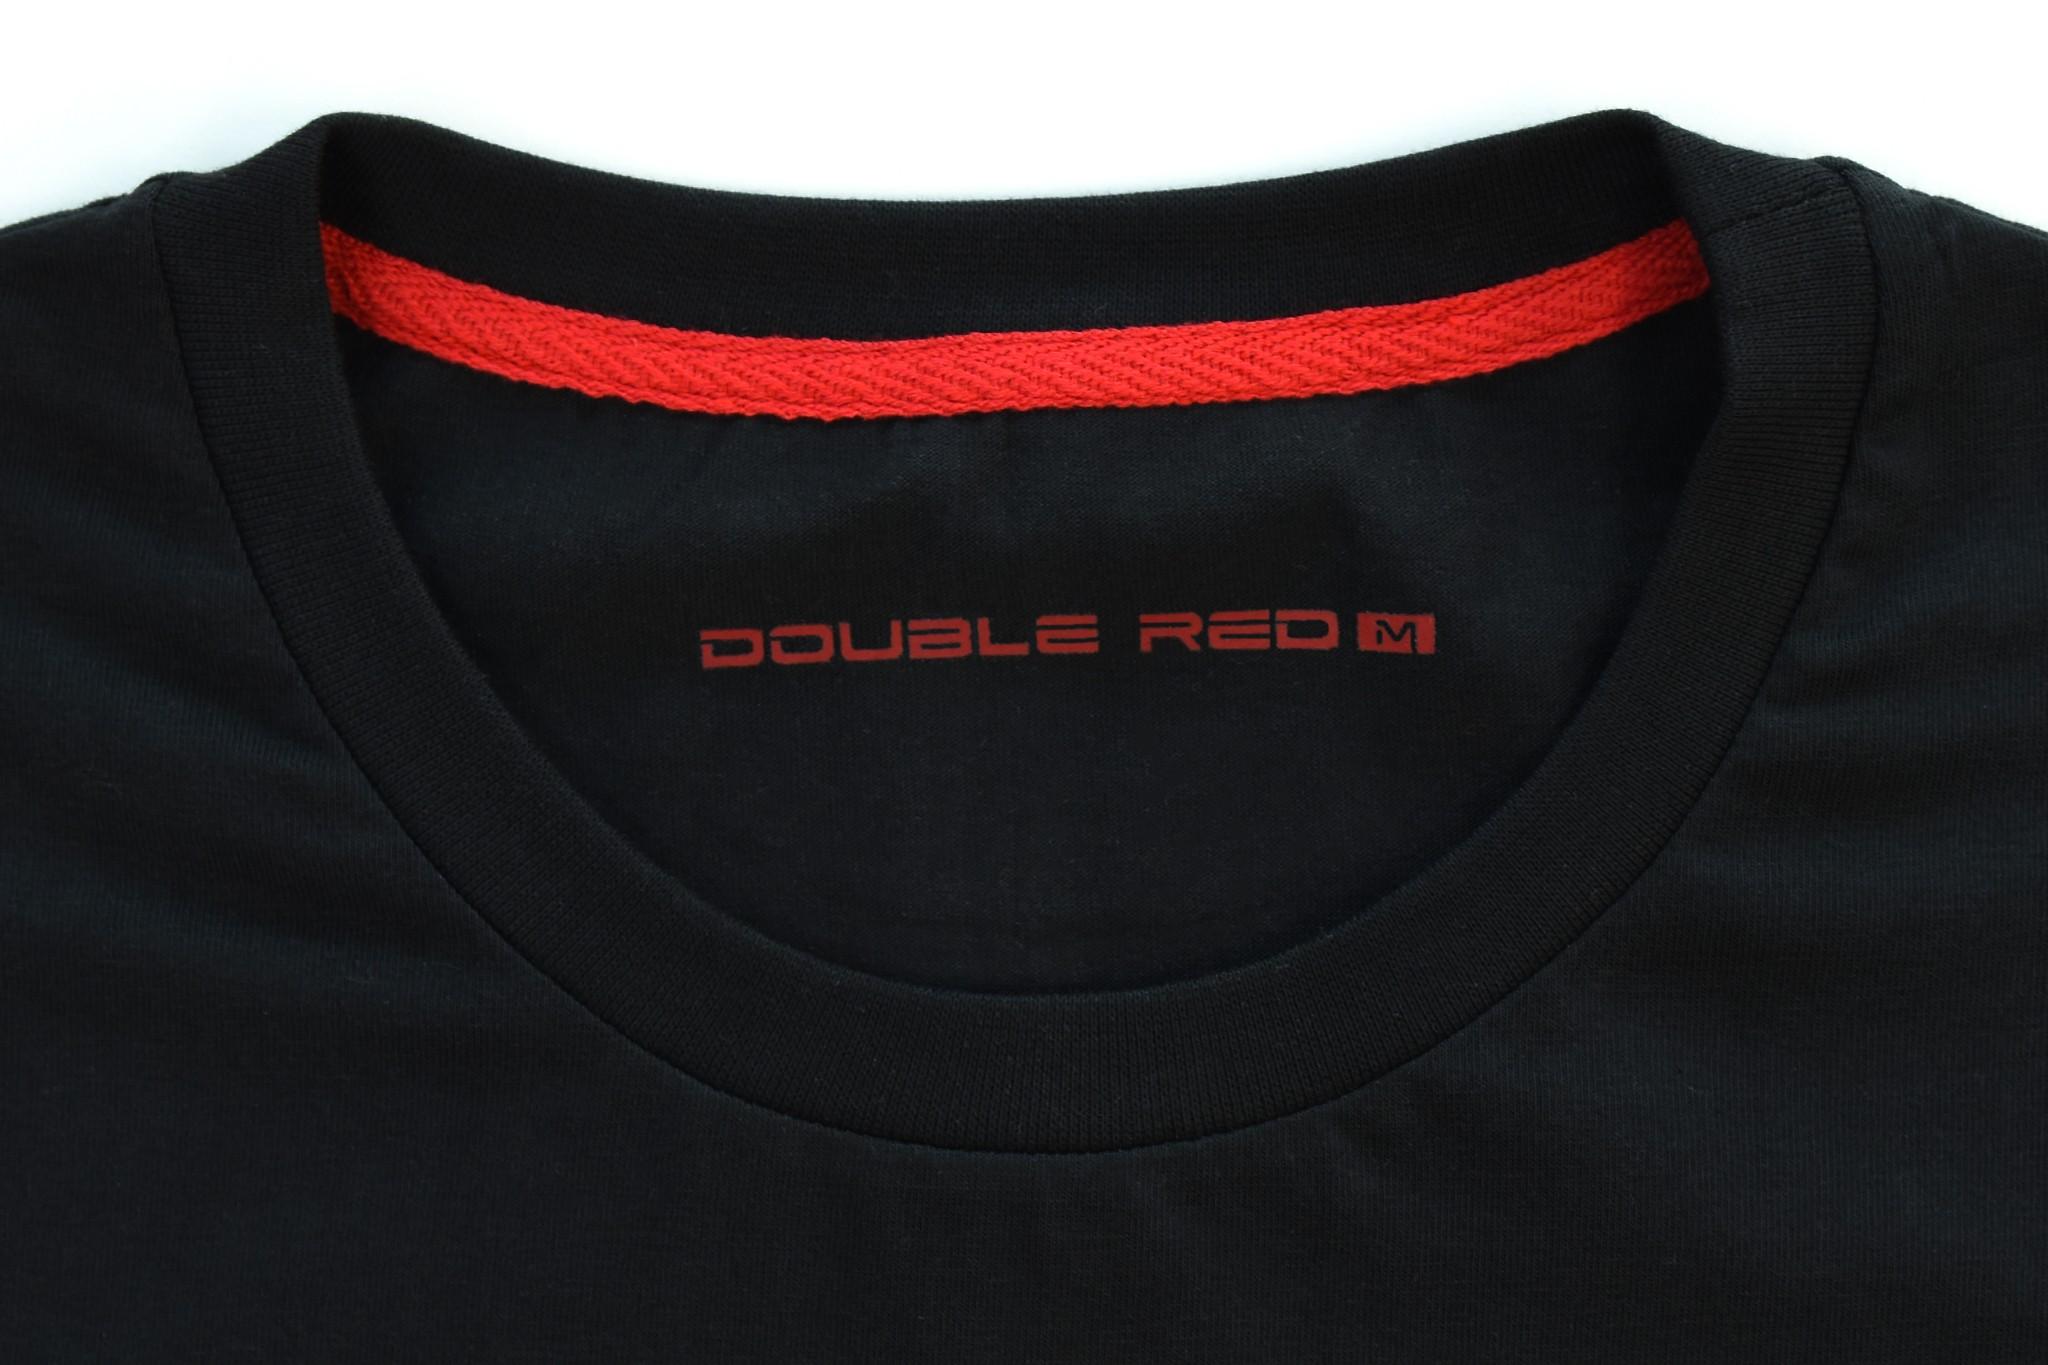 Limited Edition Pirát Krištofič T-shirt Black